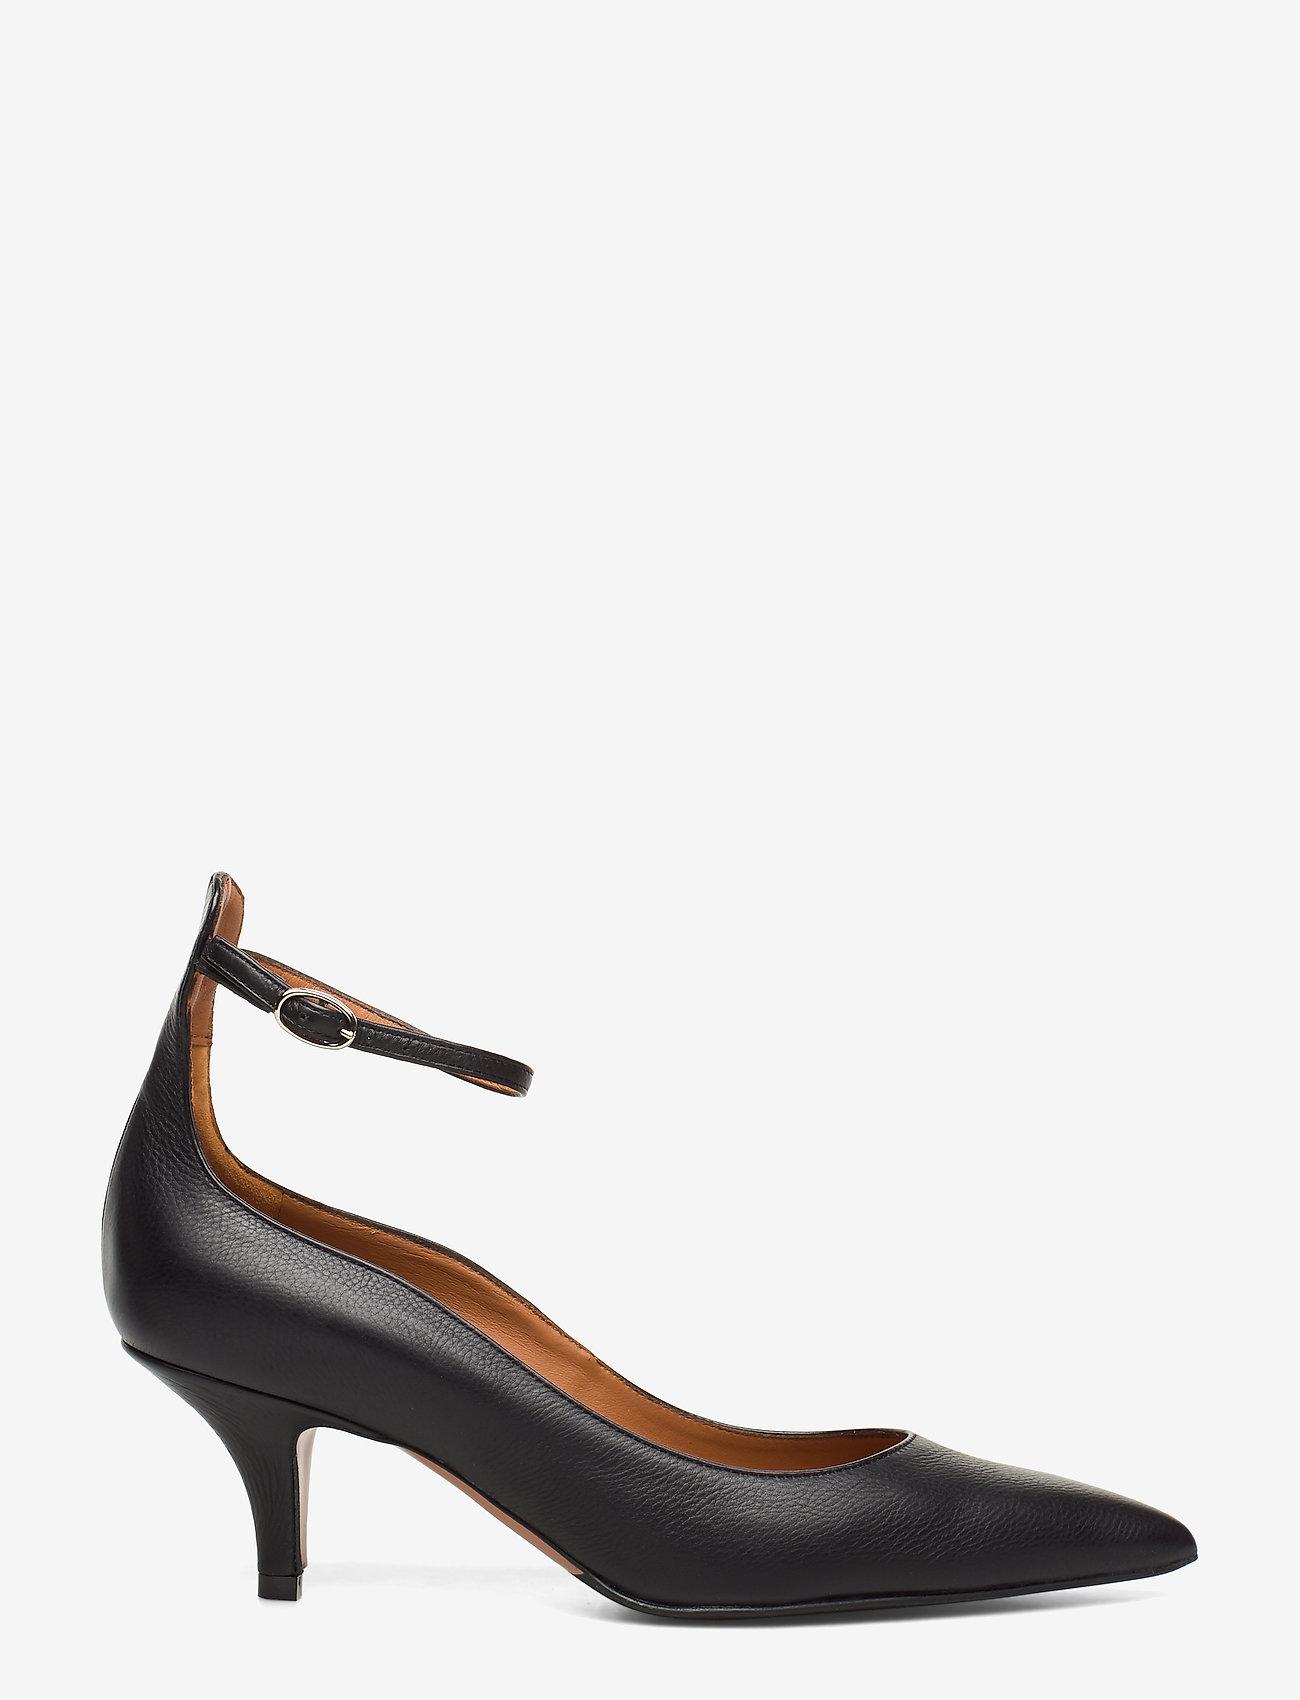 NOTABENE - Sonia - classic pumps - black leather - 1